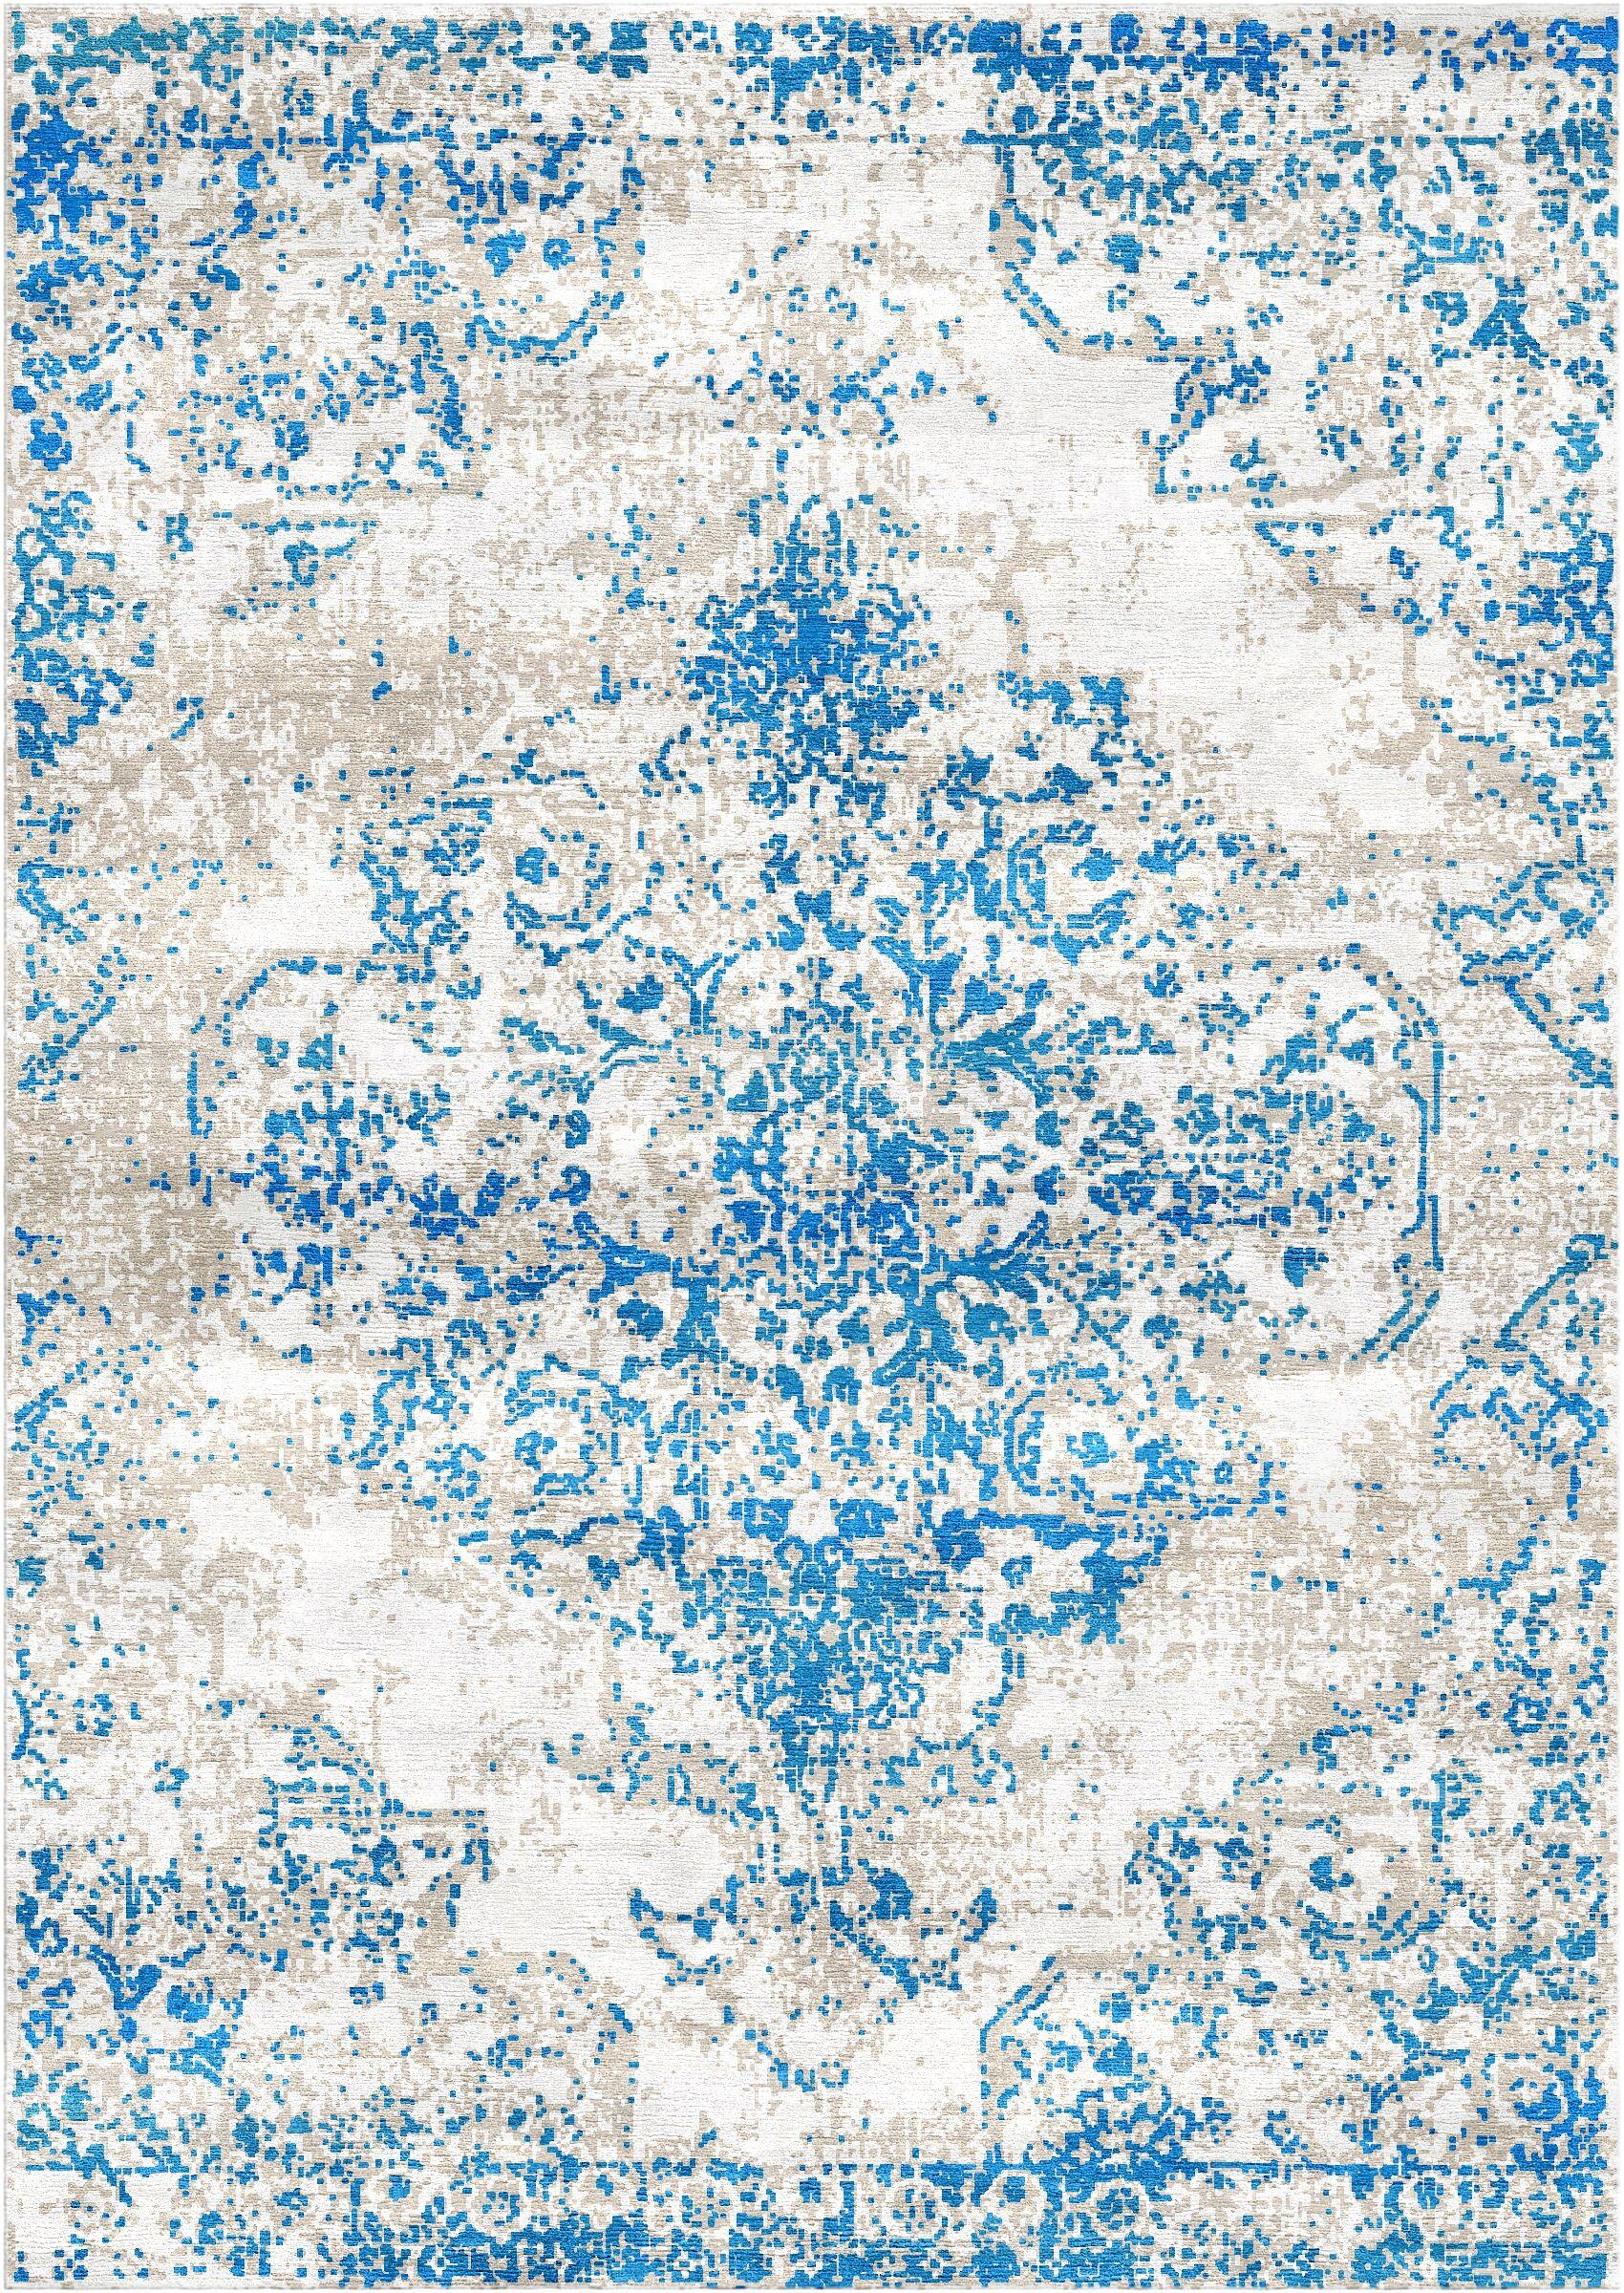 Aliza Handloom Blue/Ivory Area Rug Rug Size: Rectangle 5'7